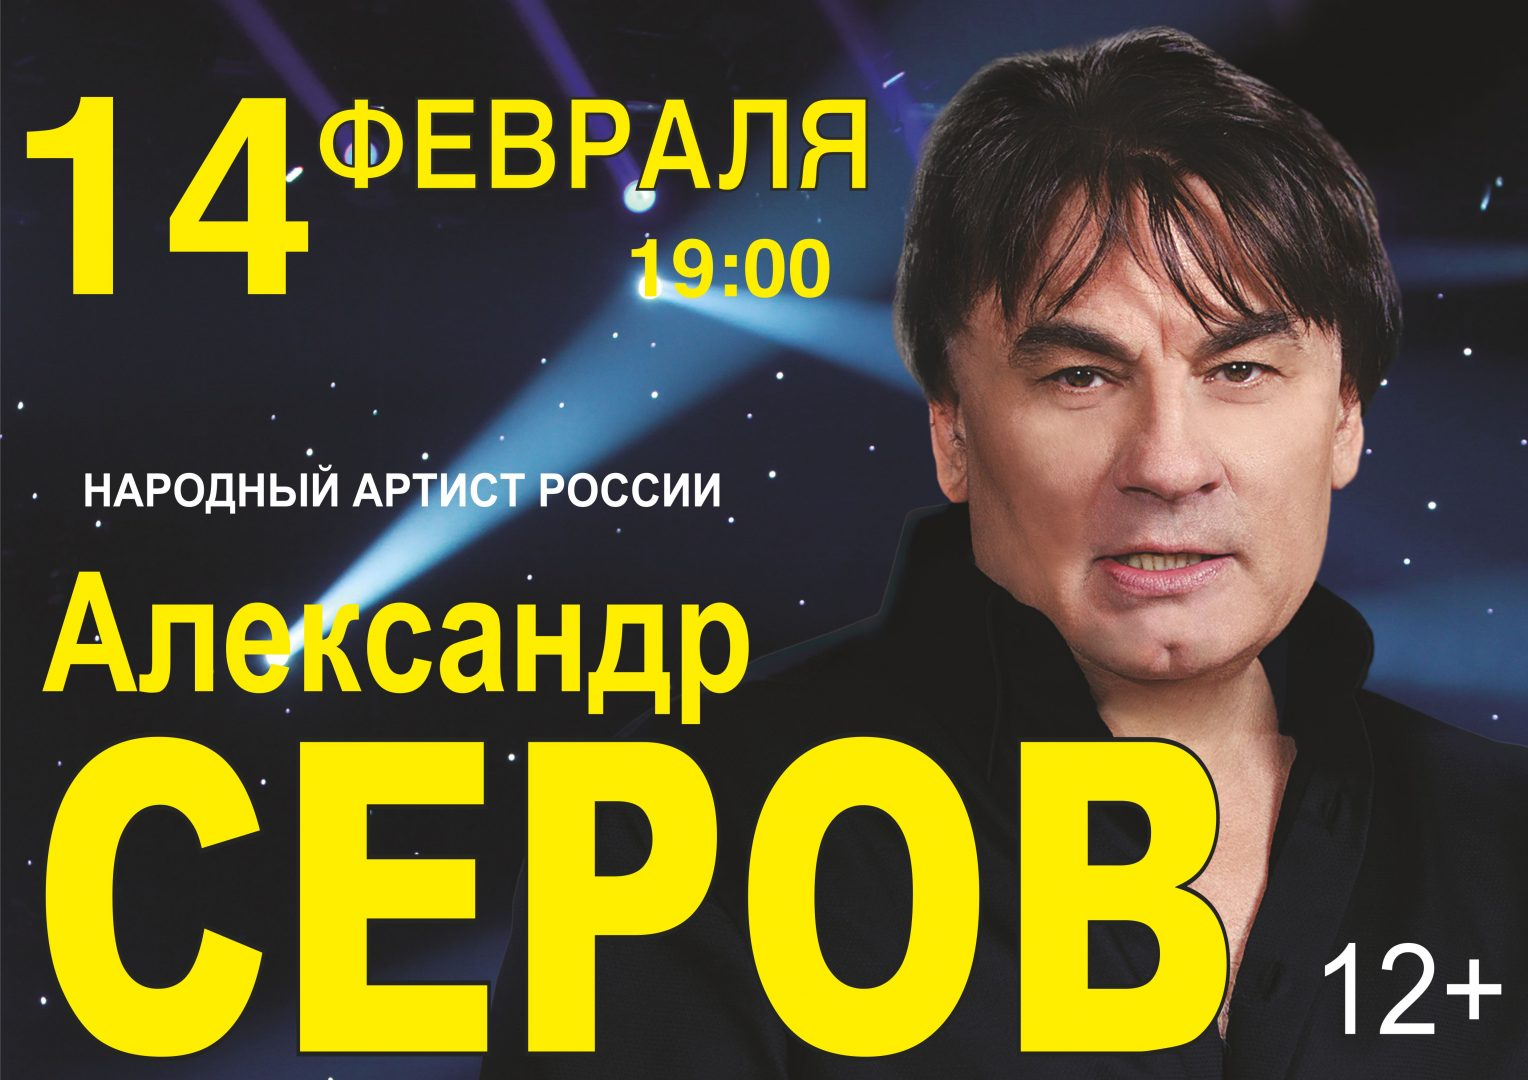 Афиша концерт А. Серова